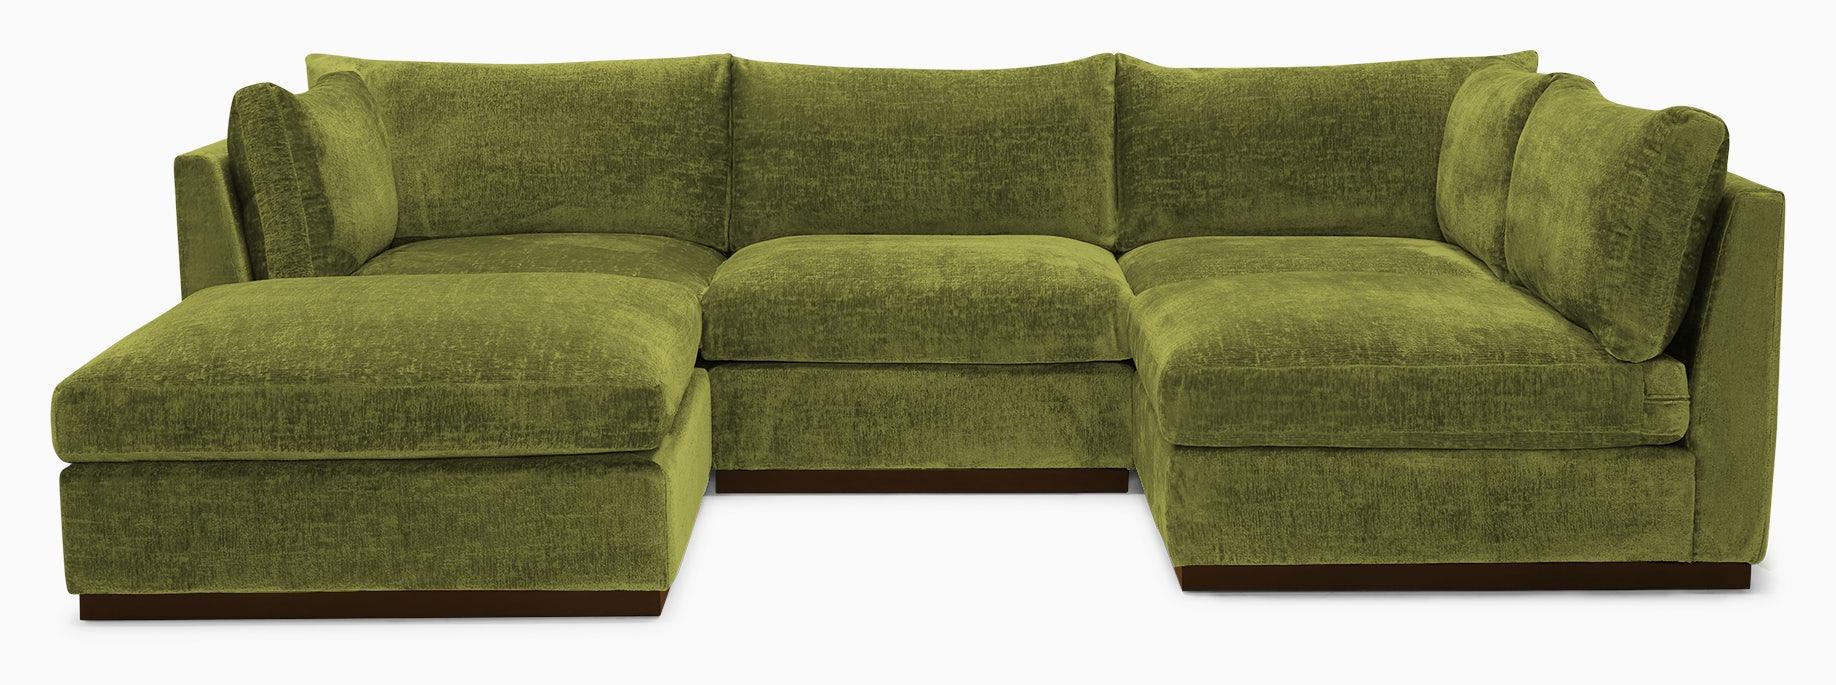 holt armless sofa sectional %285 piece%29 notion appletini